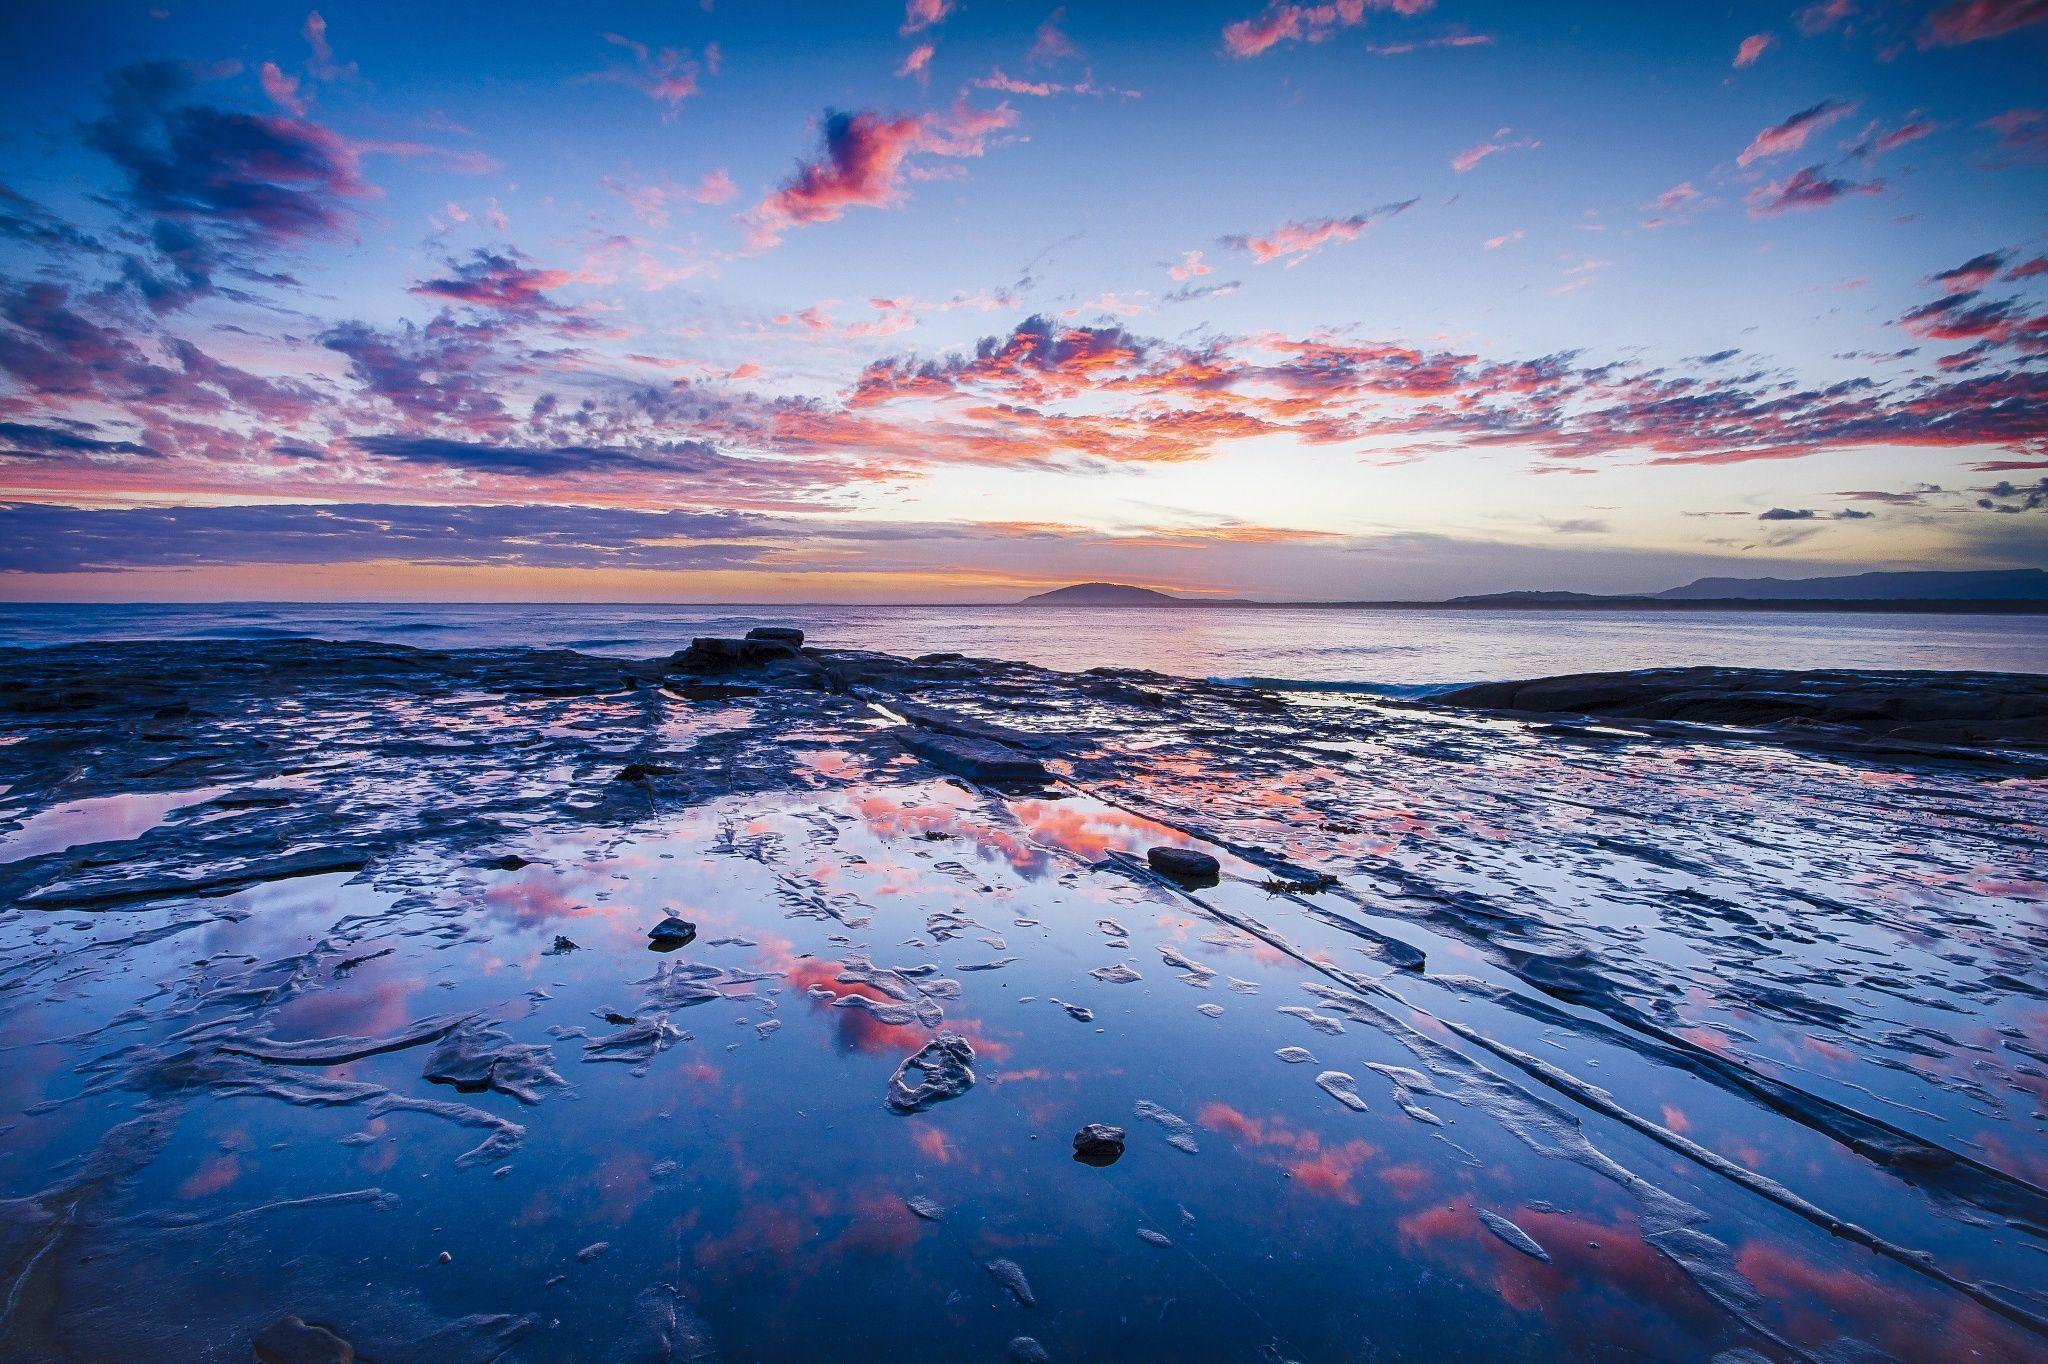 Sunset Gerroa / NSW Australia by Craig Green on 500px